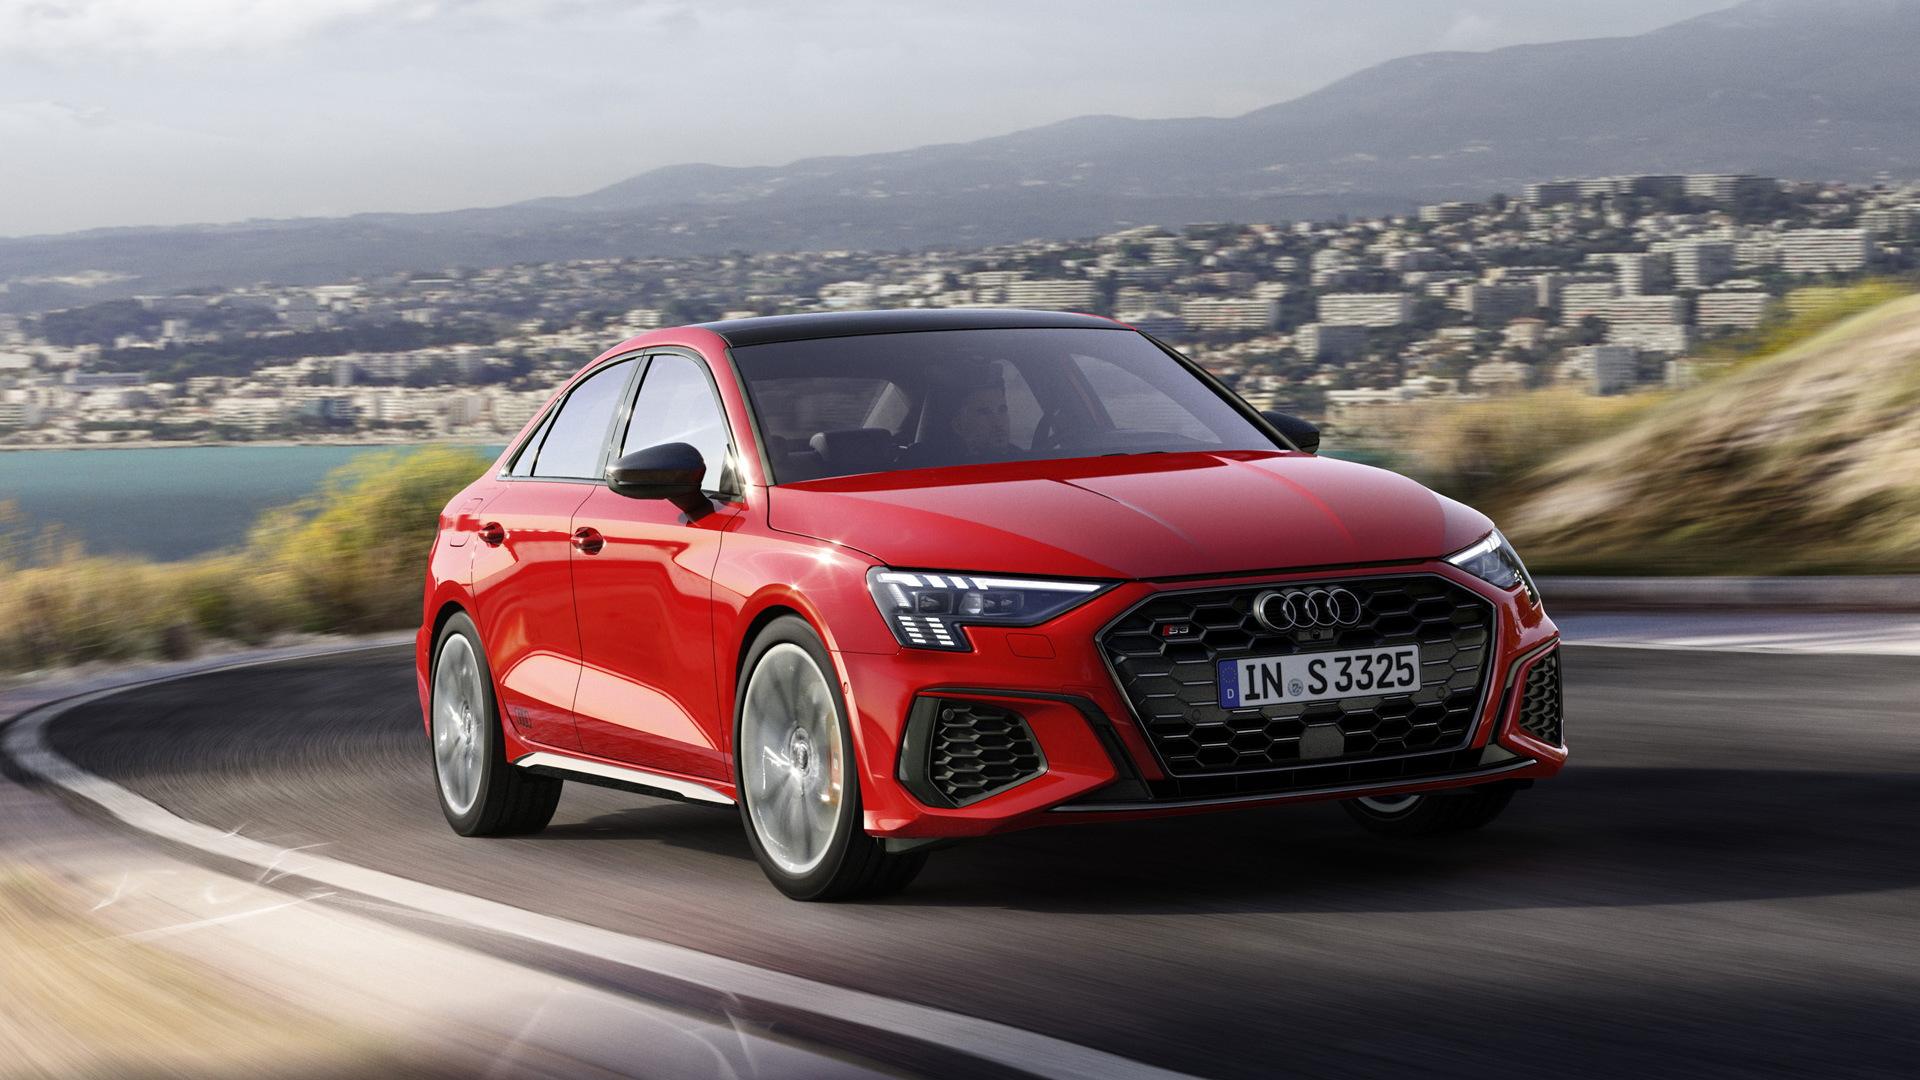 2022 Audi S3 Revealed